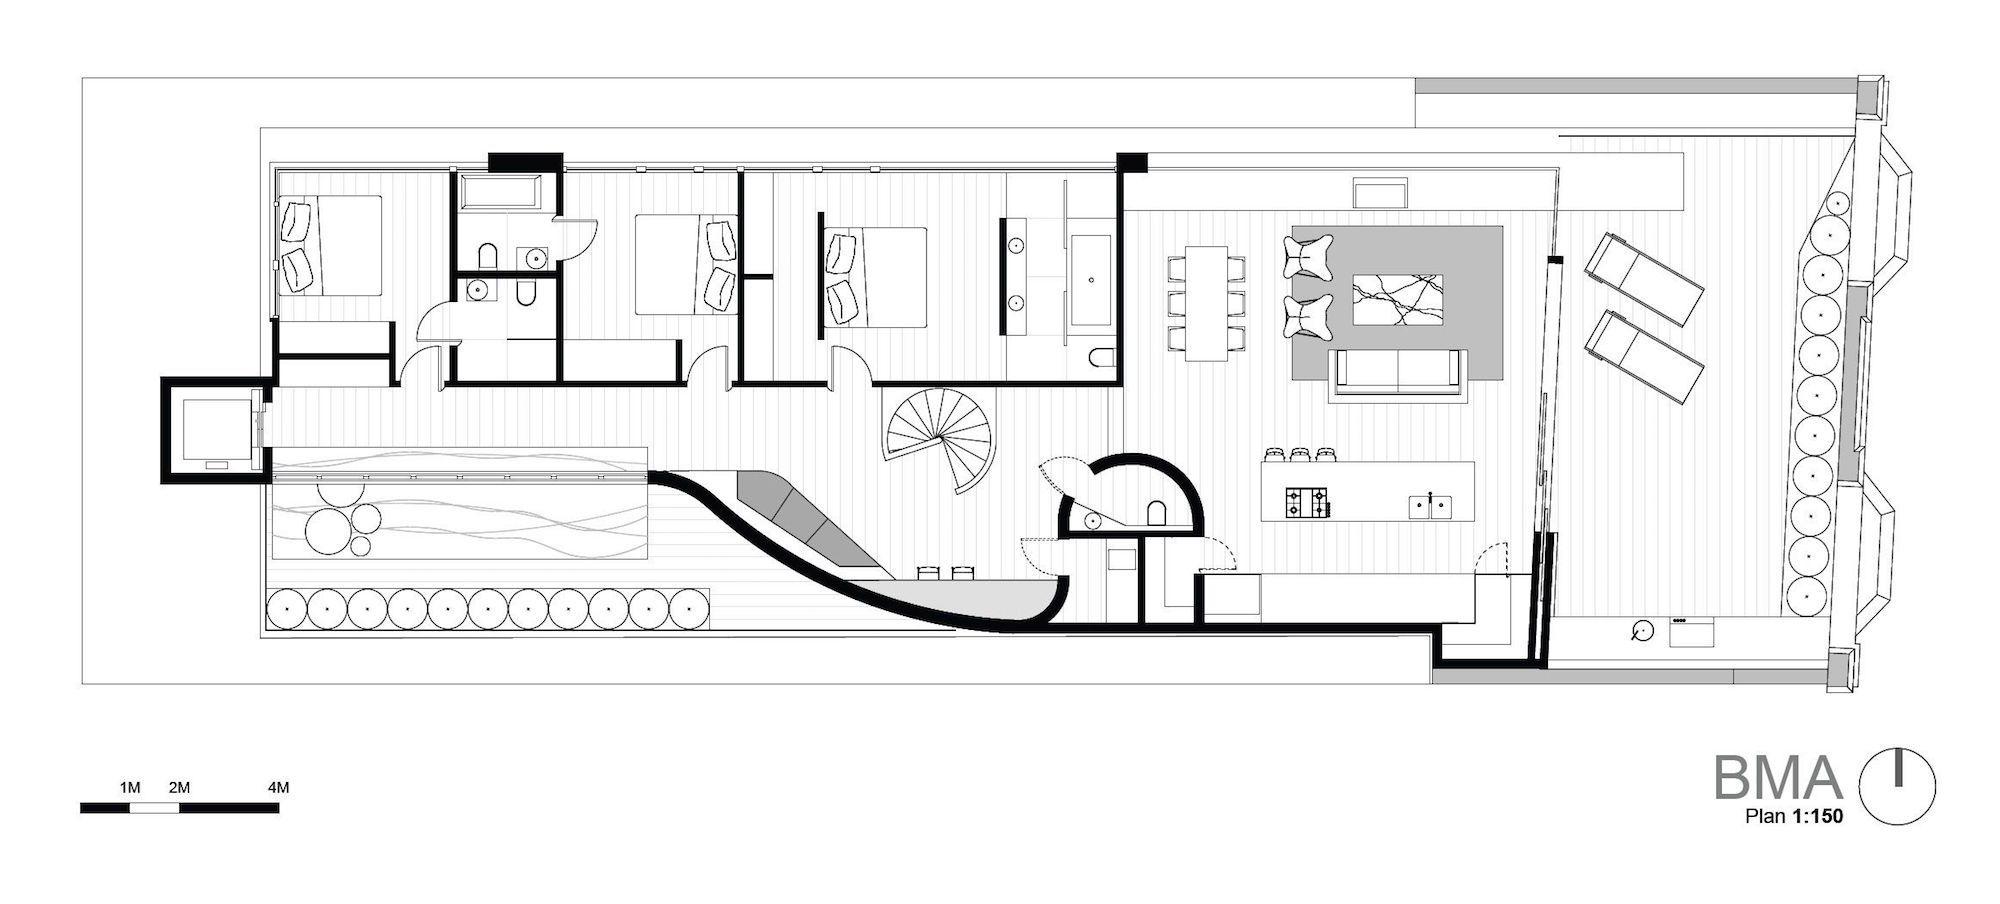 Bondi-Penthouse-21